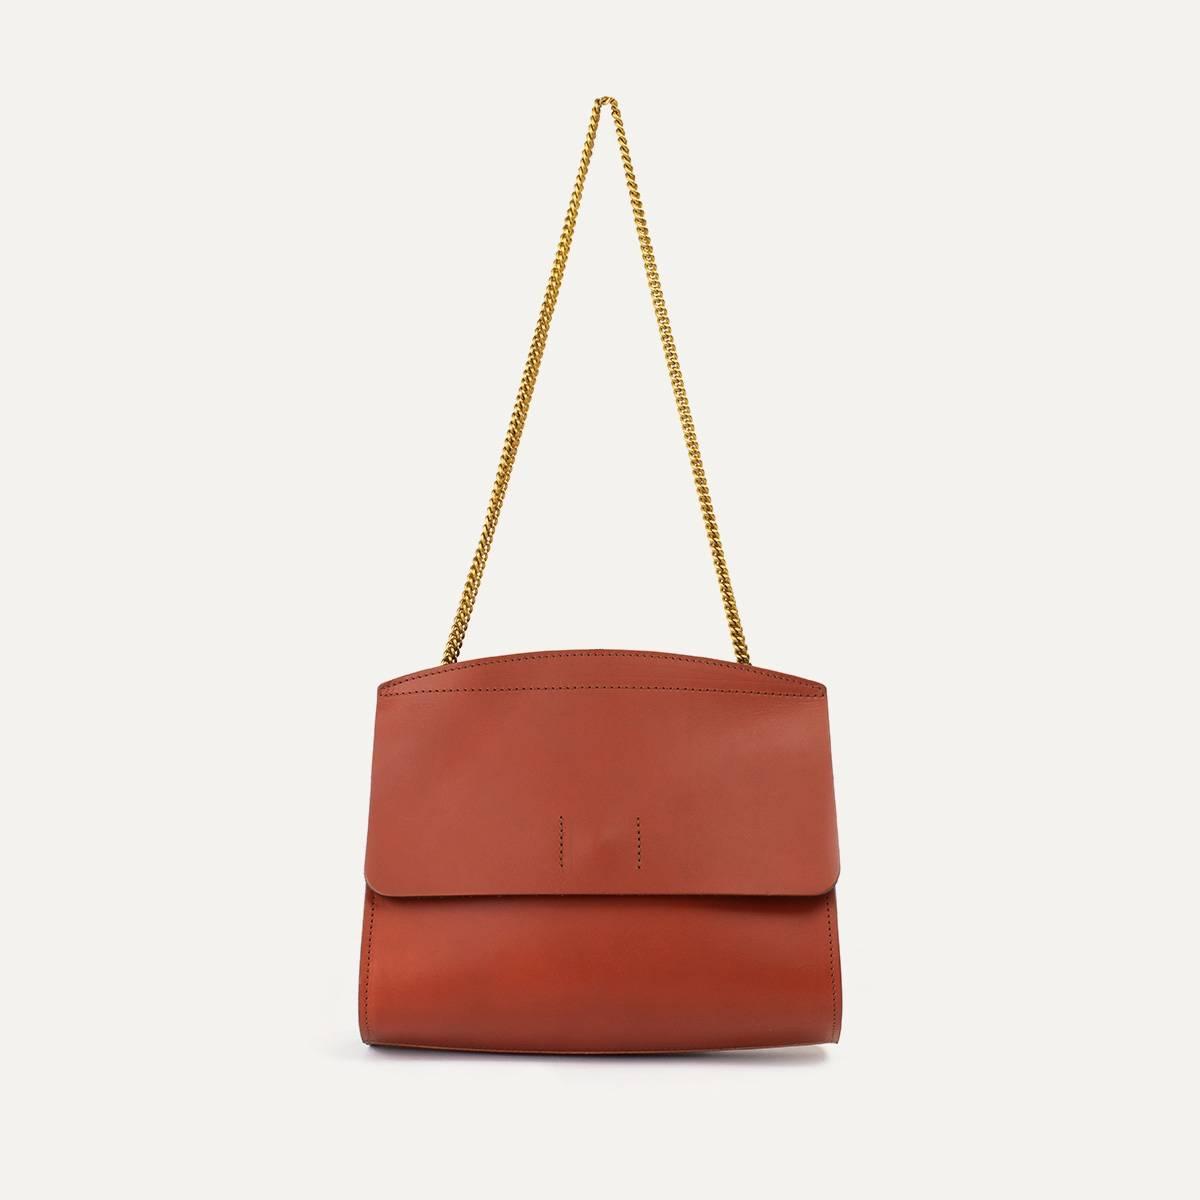 Origami S clutch bag - Rust (image n°3)